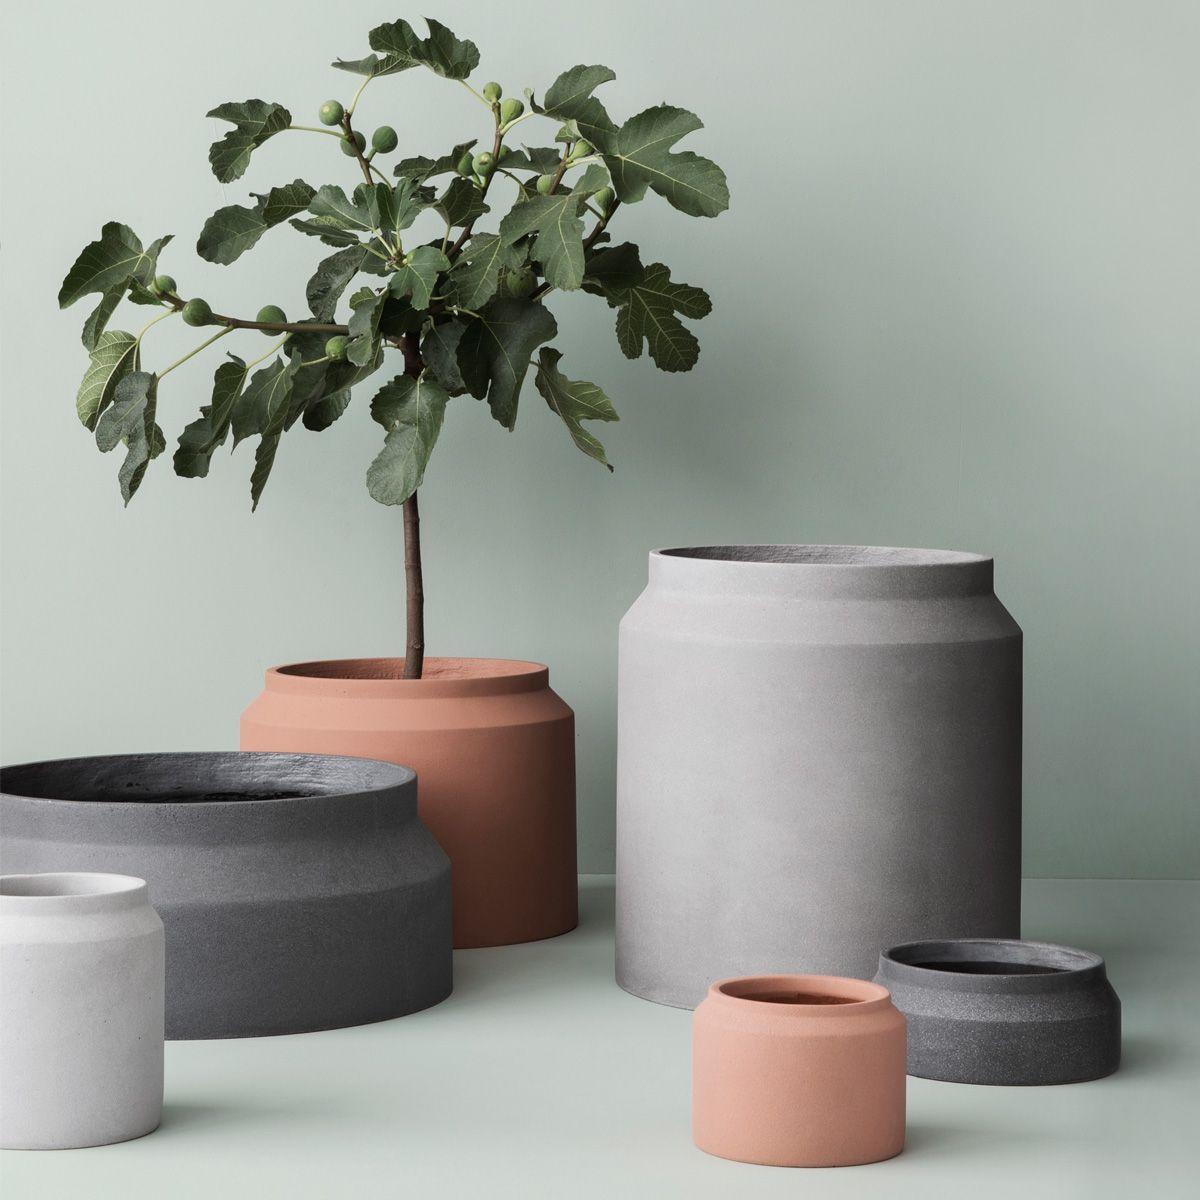 Concrete Planters Trnk Vasi Di Cemento Fioriere Interne Vasi